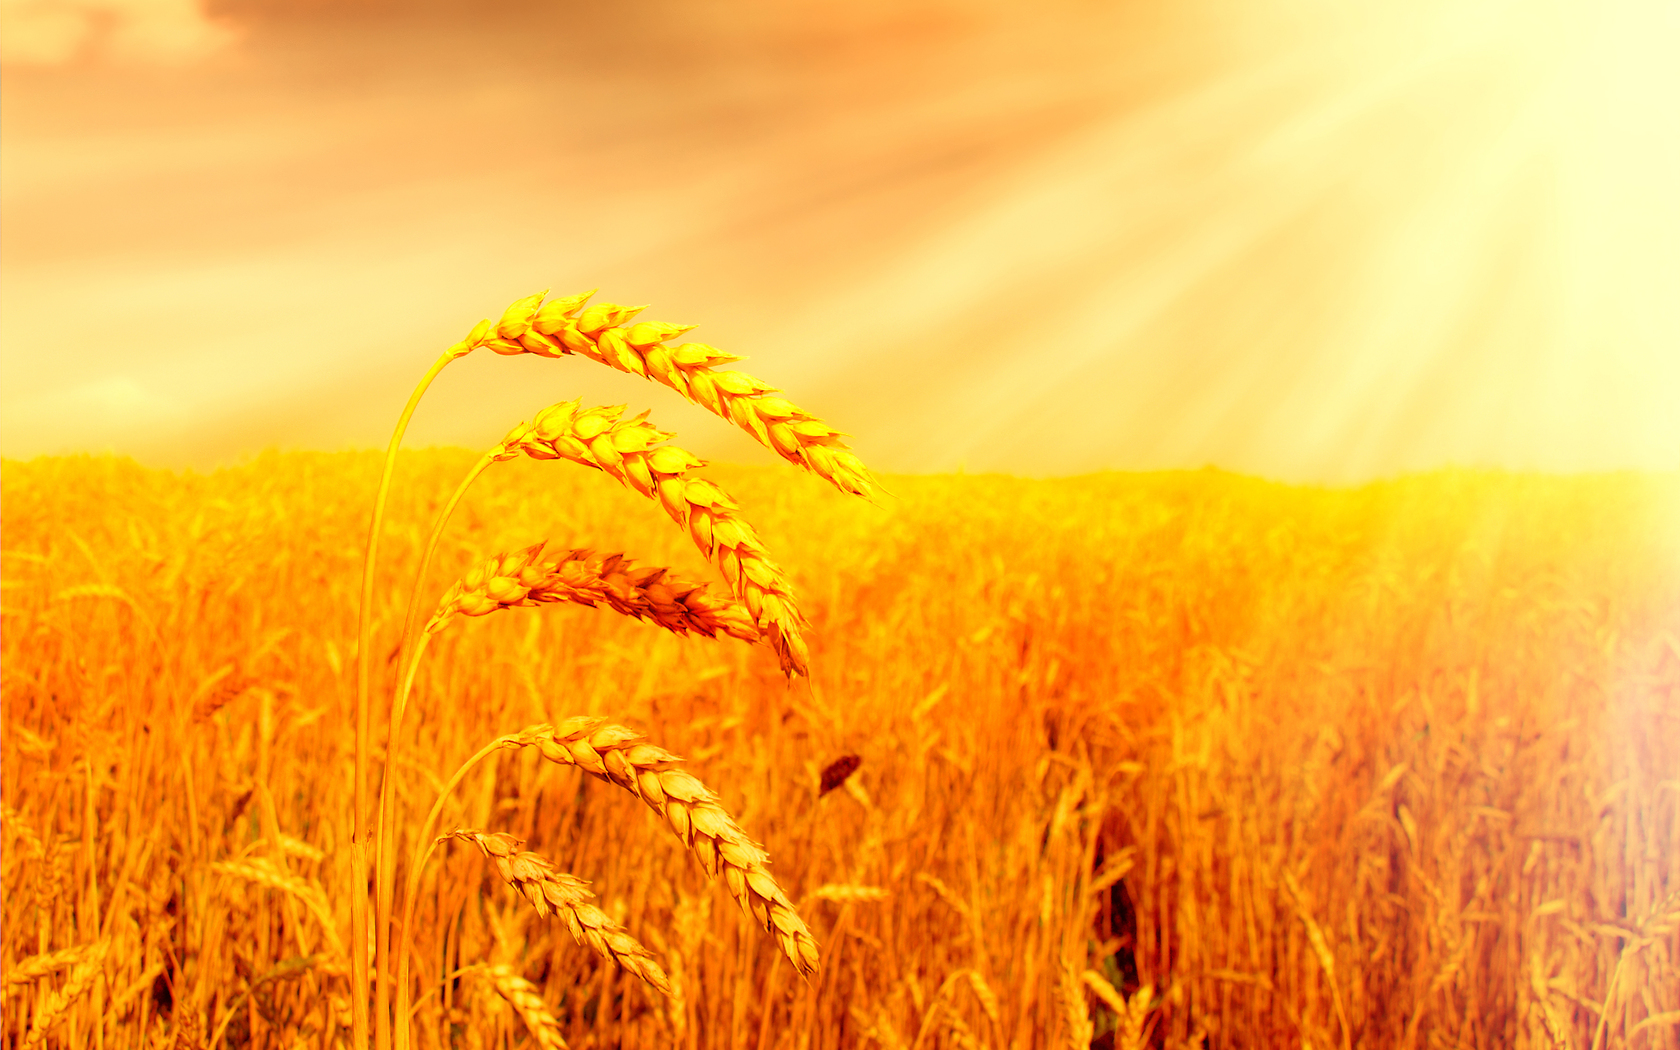 Wheat Comput... Harvest Background Images For Desktop